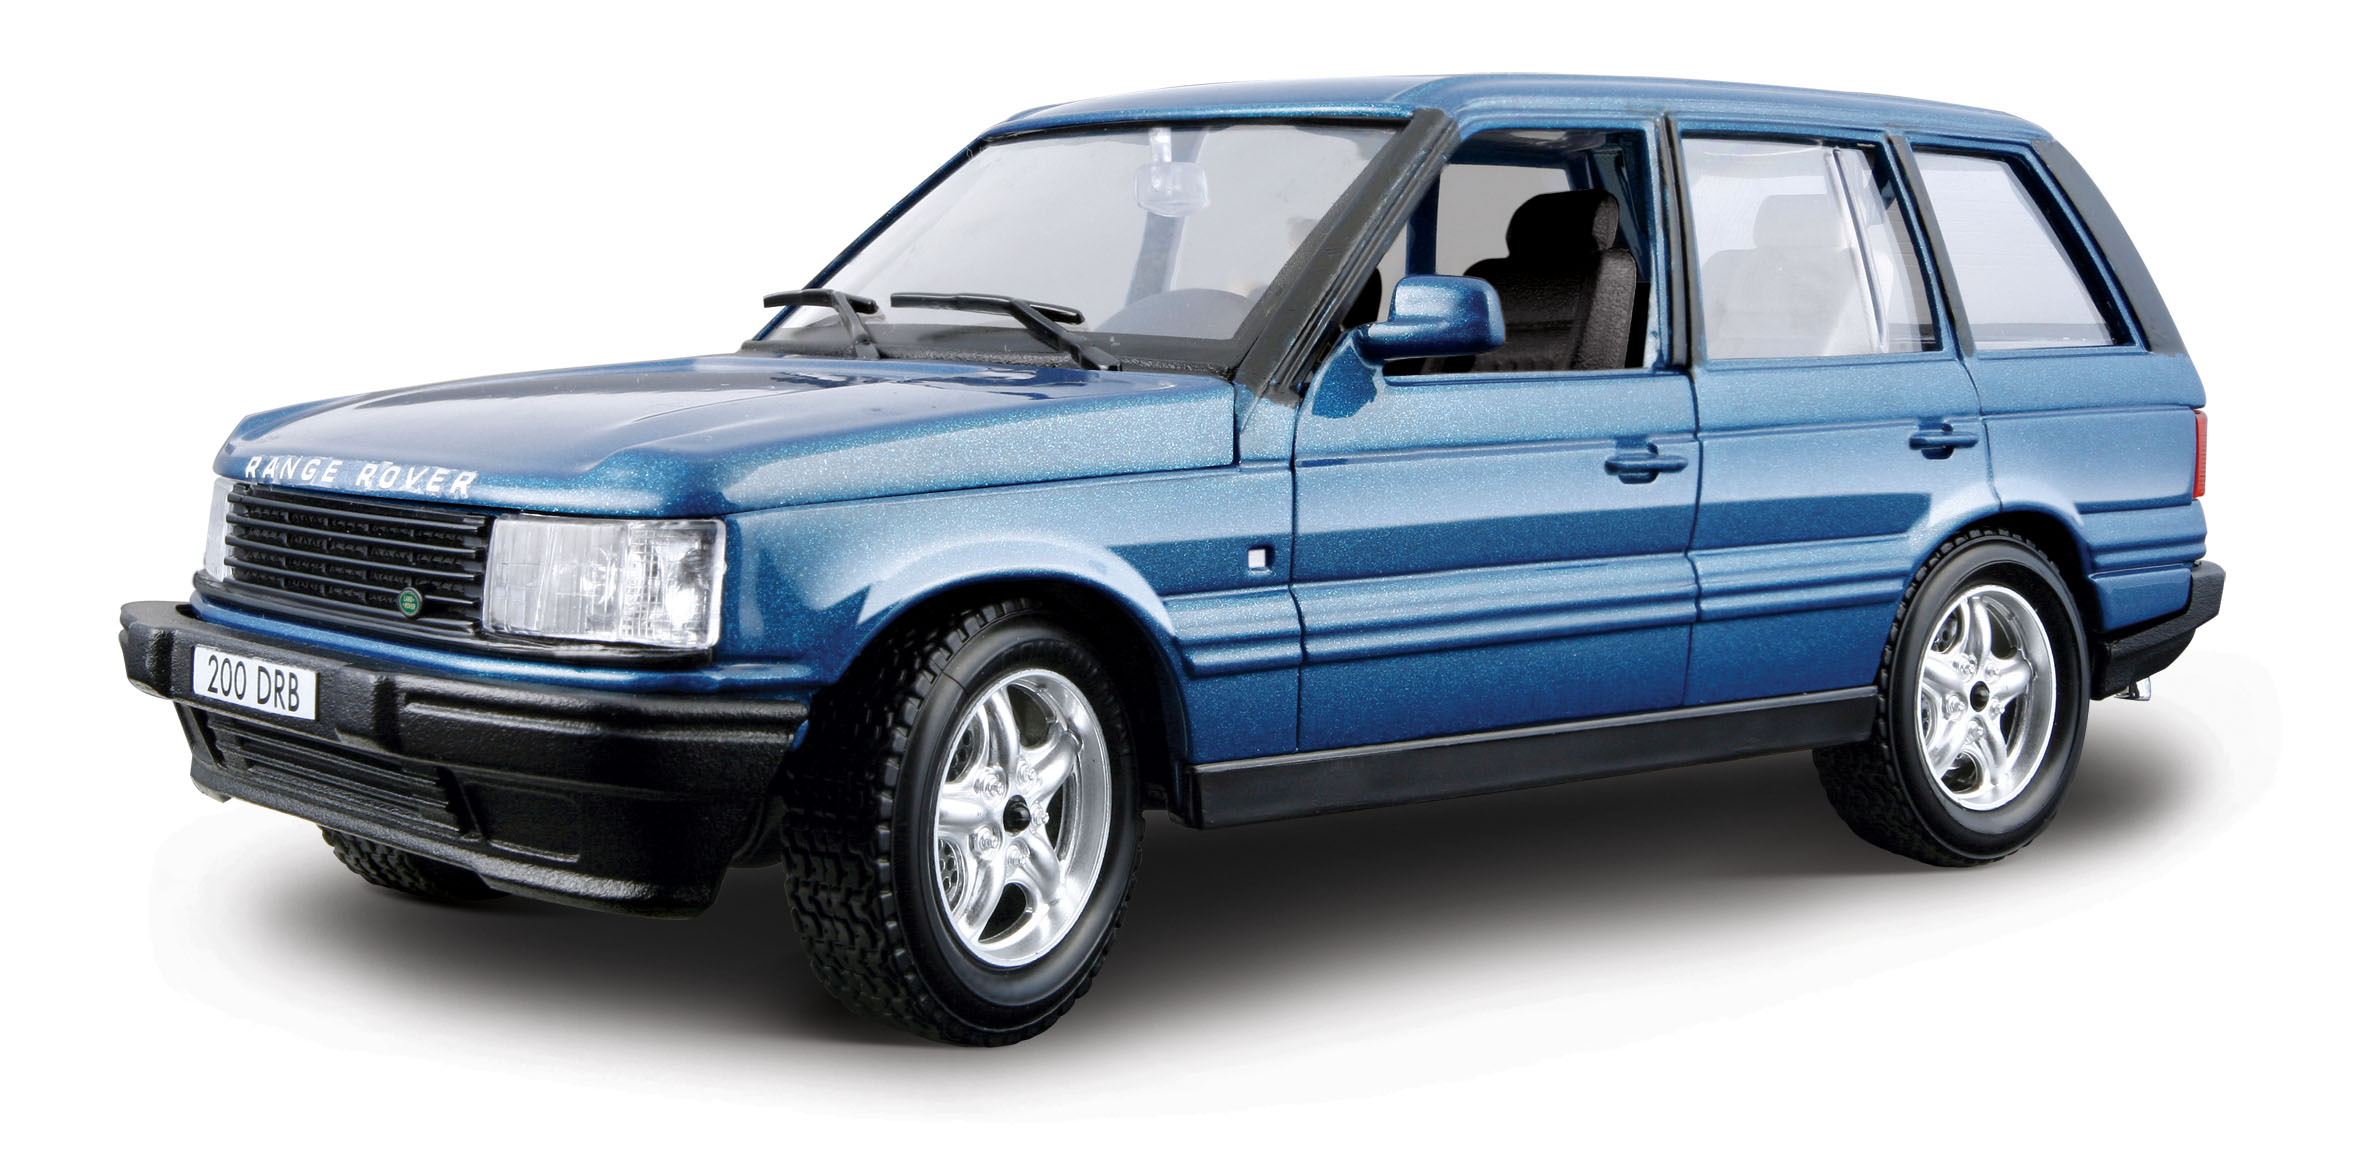 hattons Burago 18 CB Kit Range Rover 1994